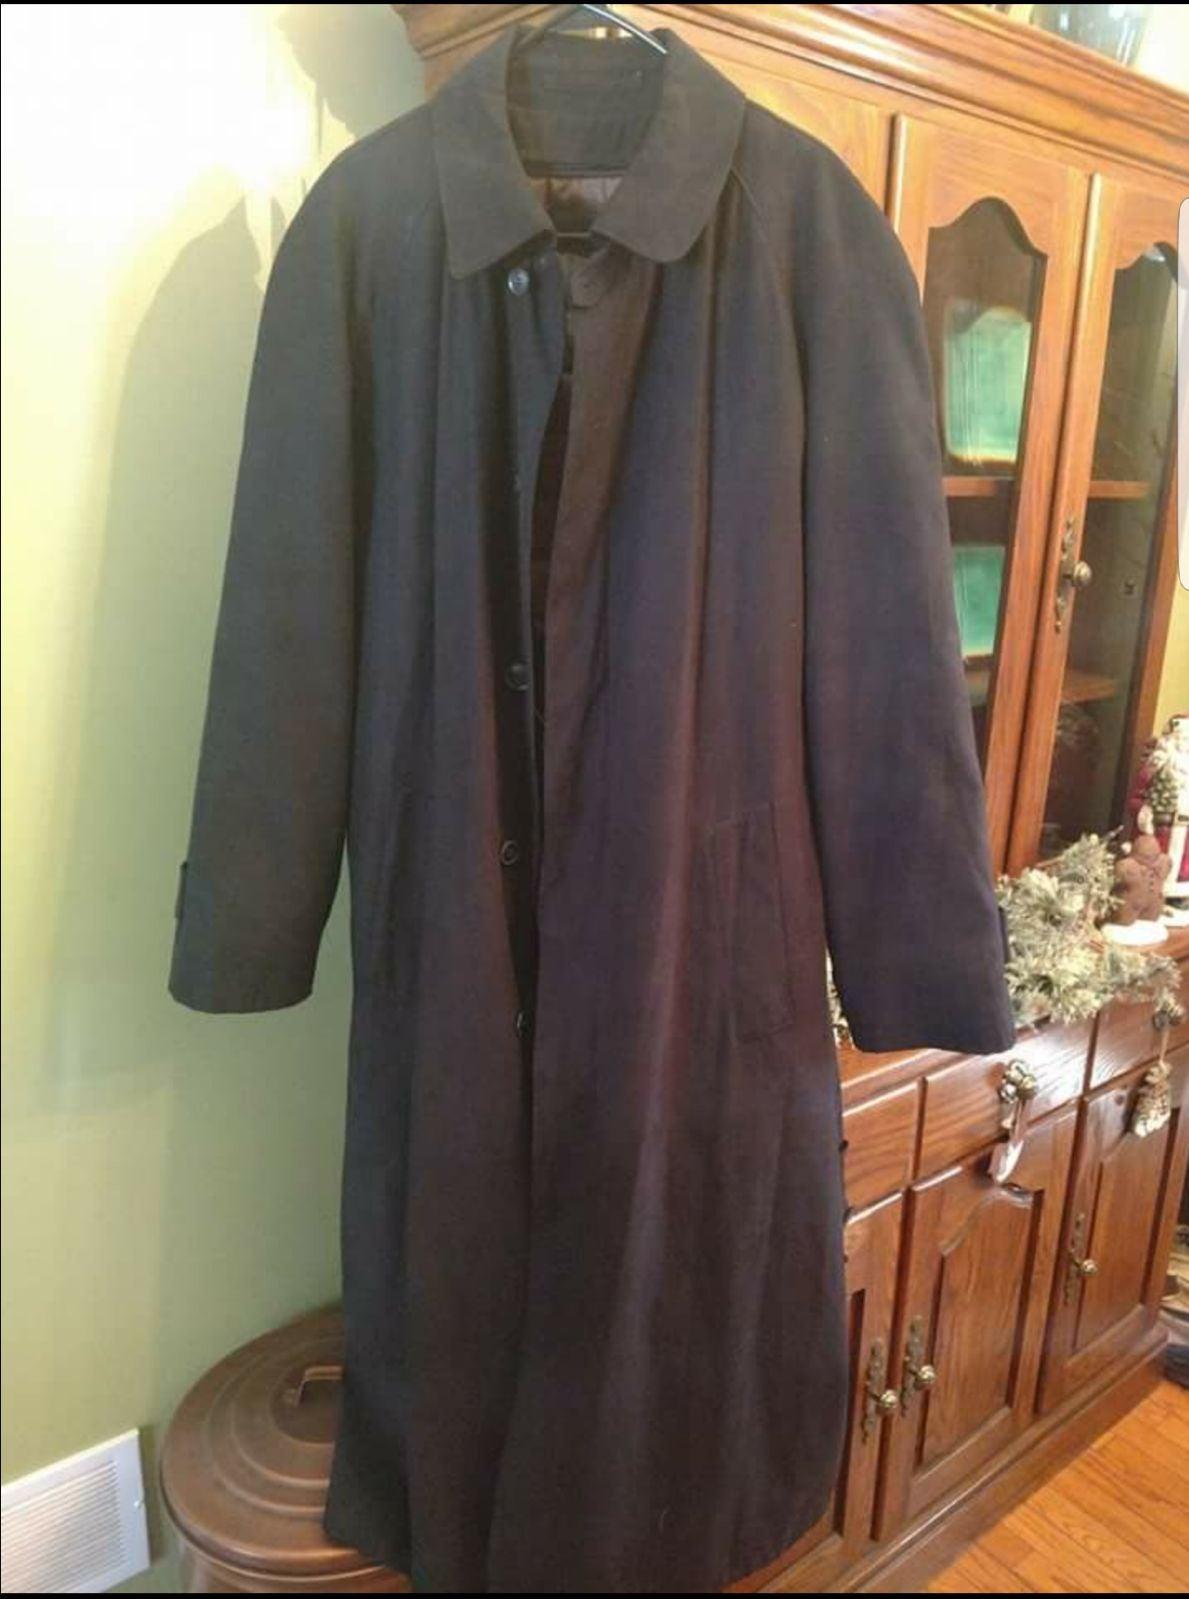 Bill blass vintage trench coat